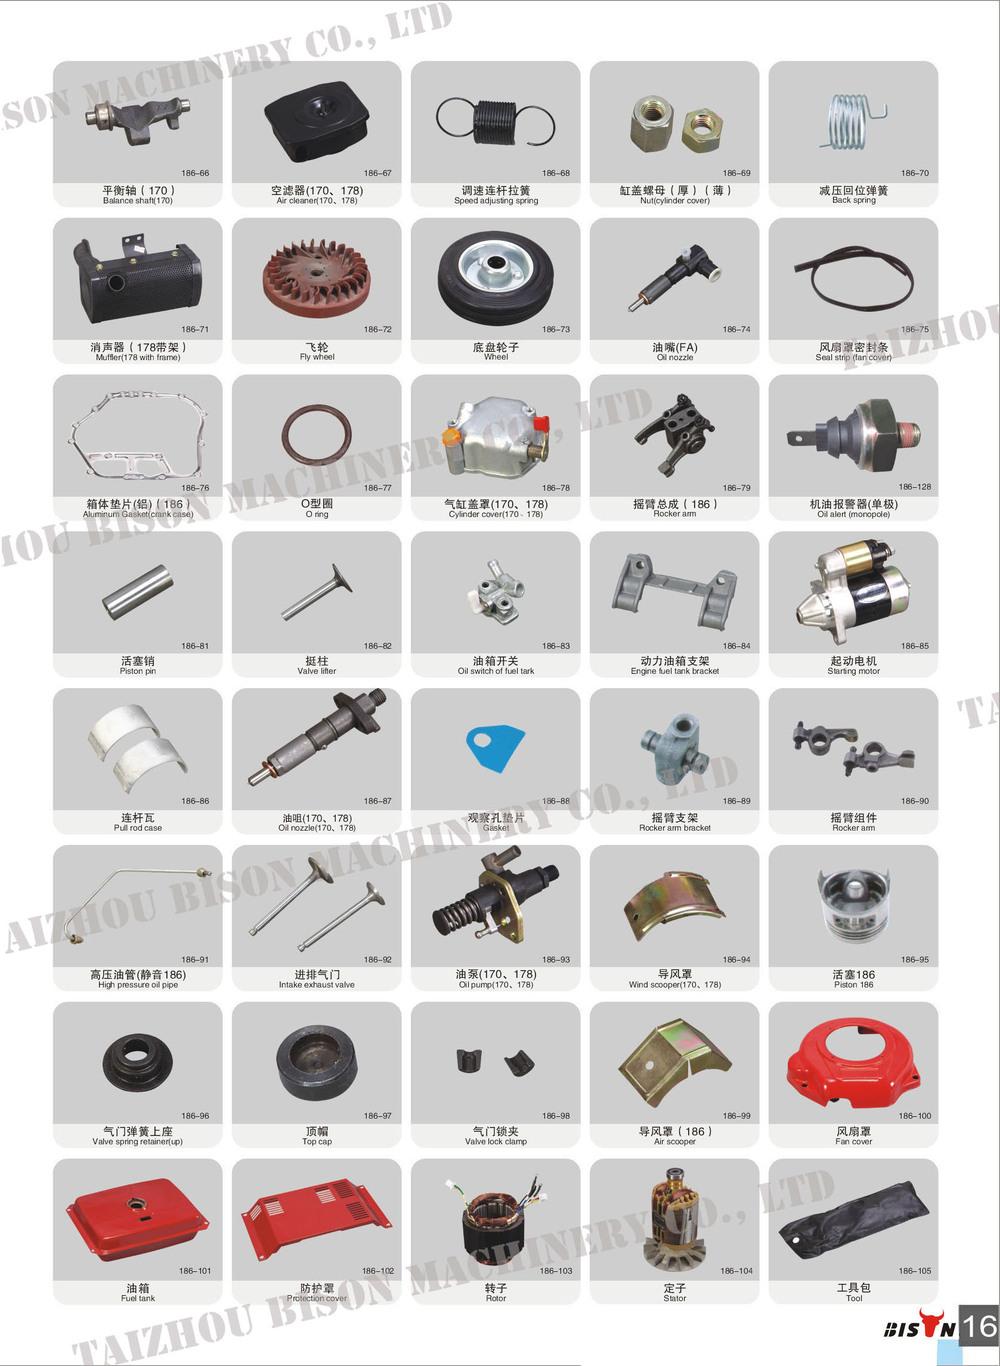 Diesel Engine 170f Spare Parts,178f Diesel Engine Parts,186f Diesel ...